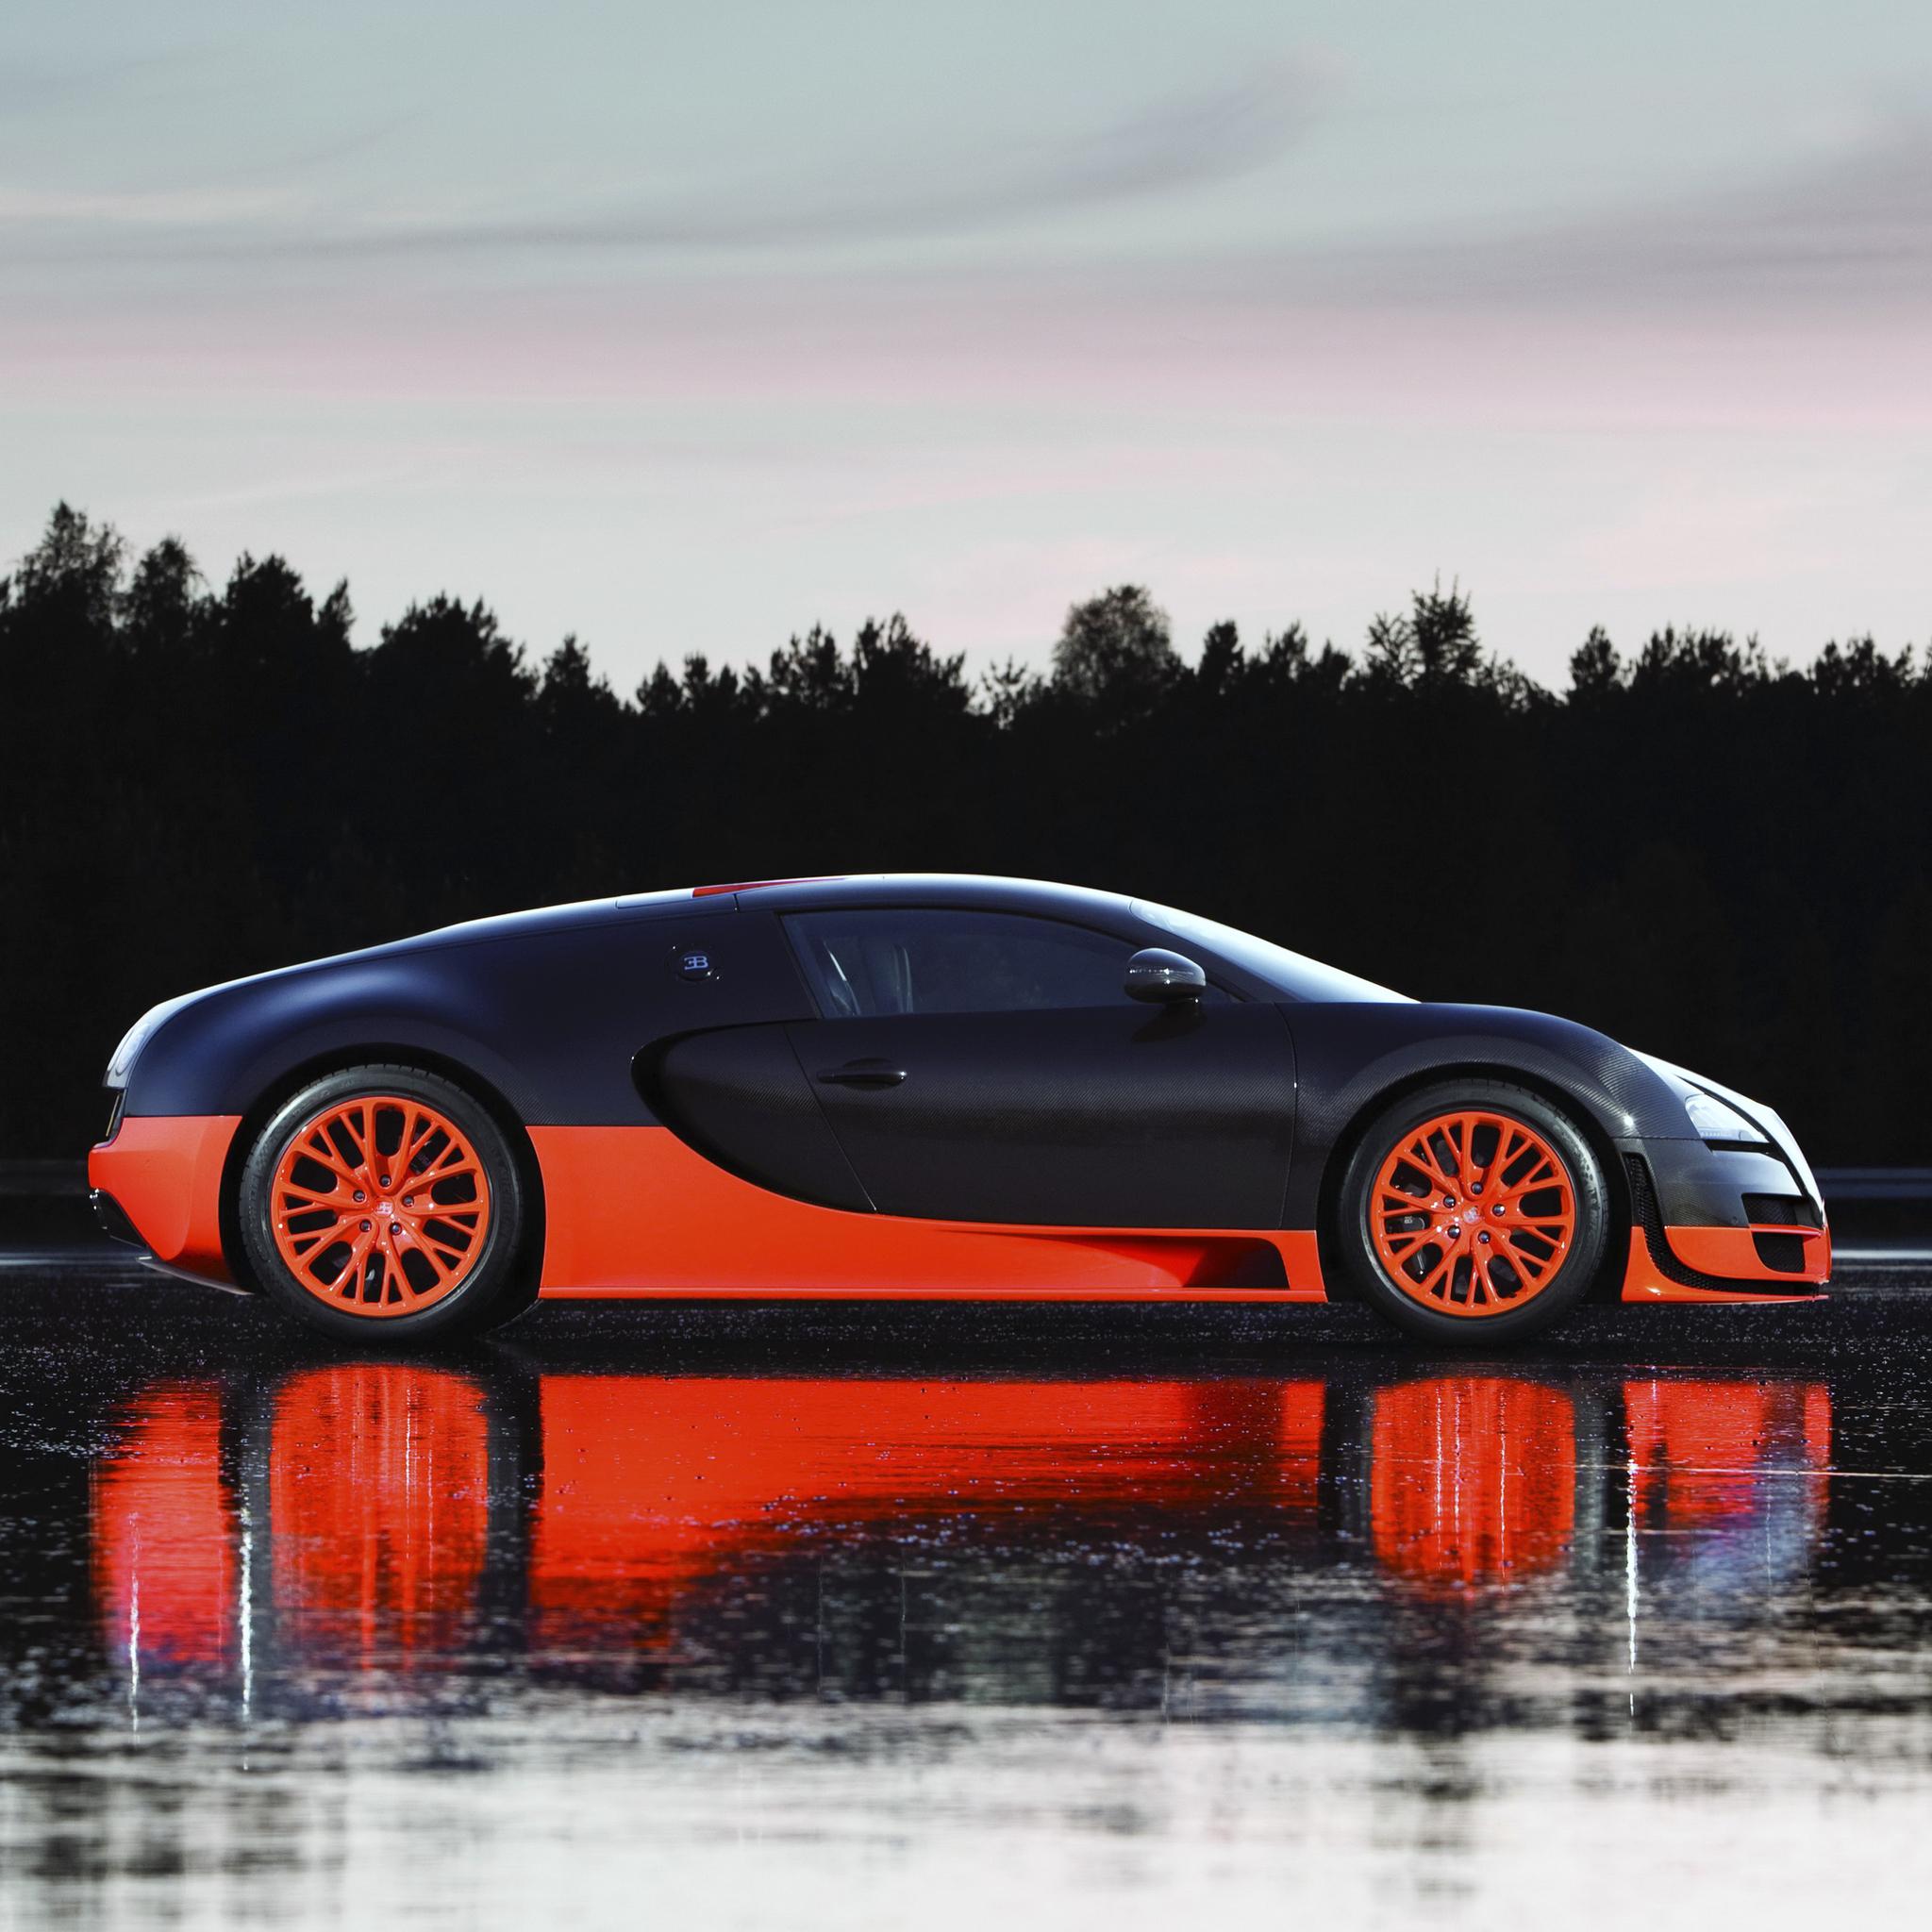 4k-bugatti-veyron-super-sport-world-record-edition-l2.jpg